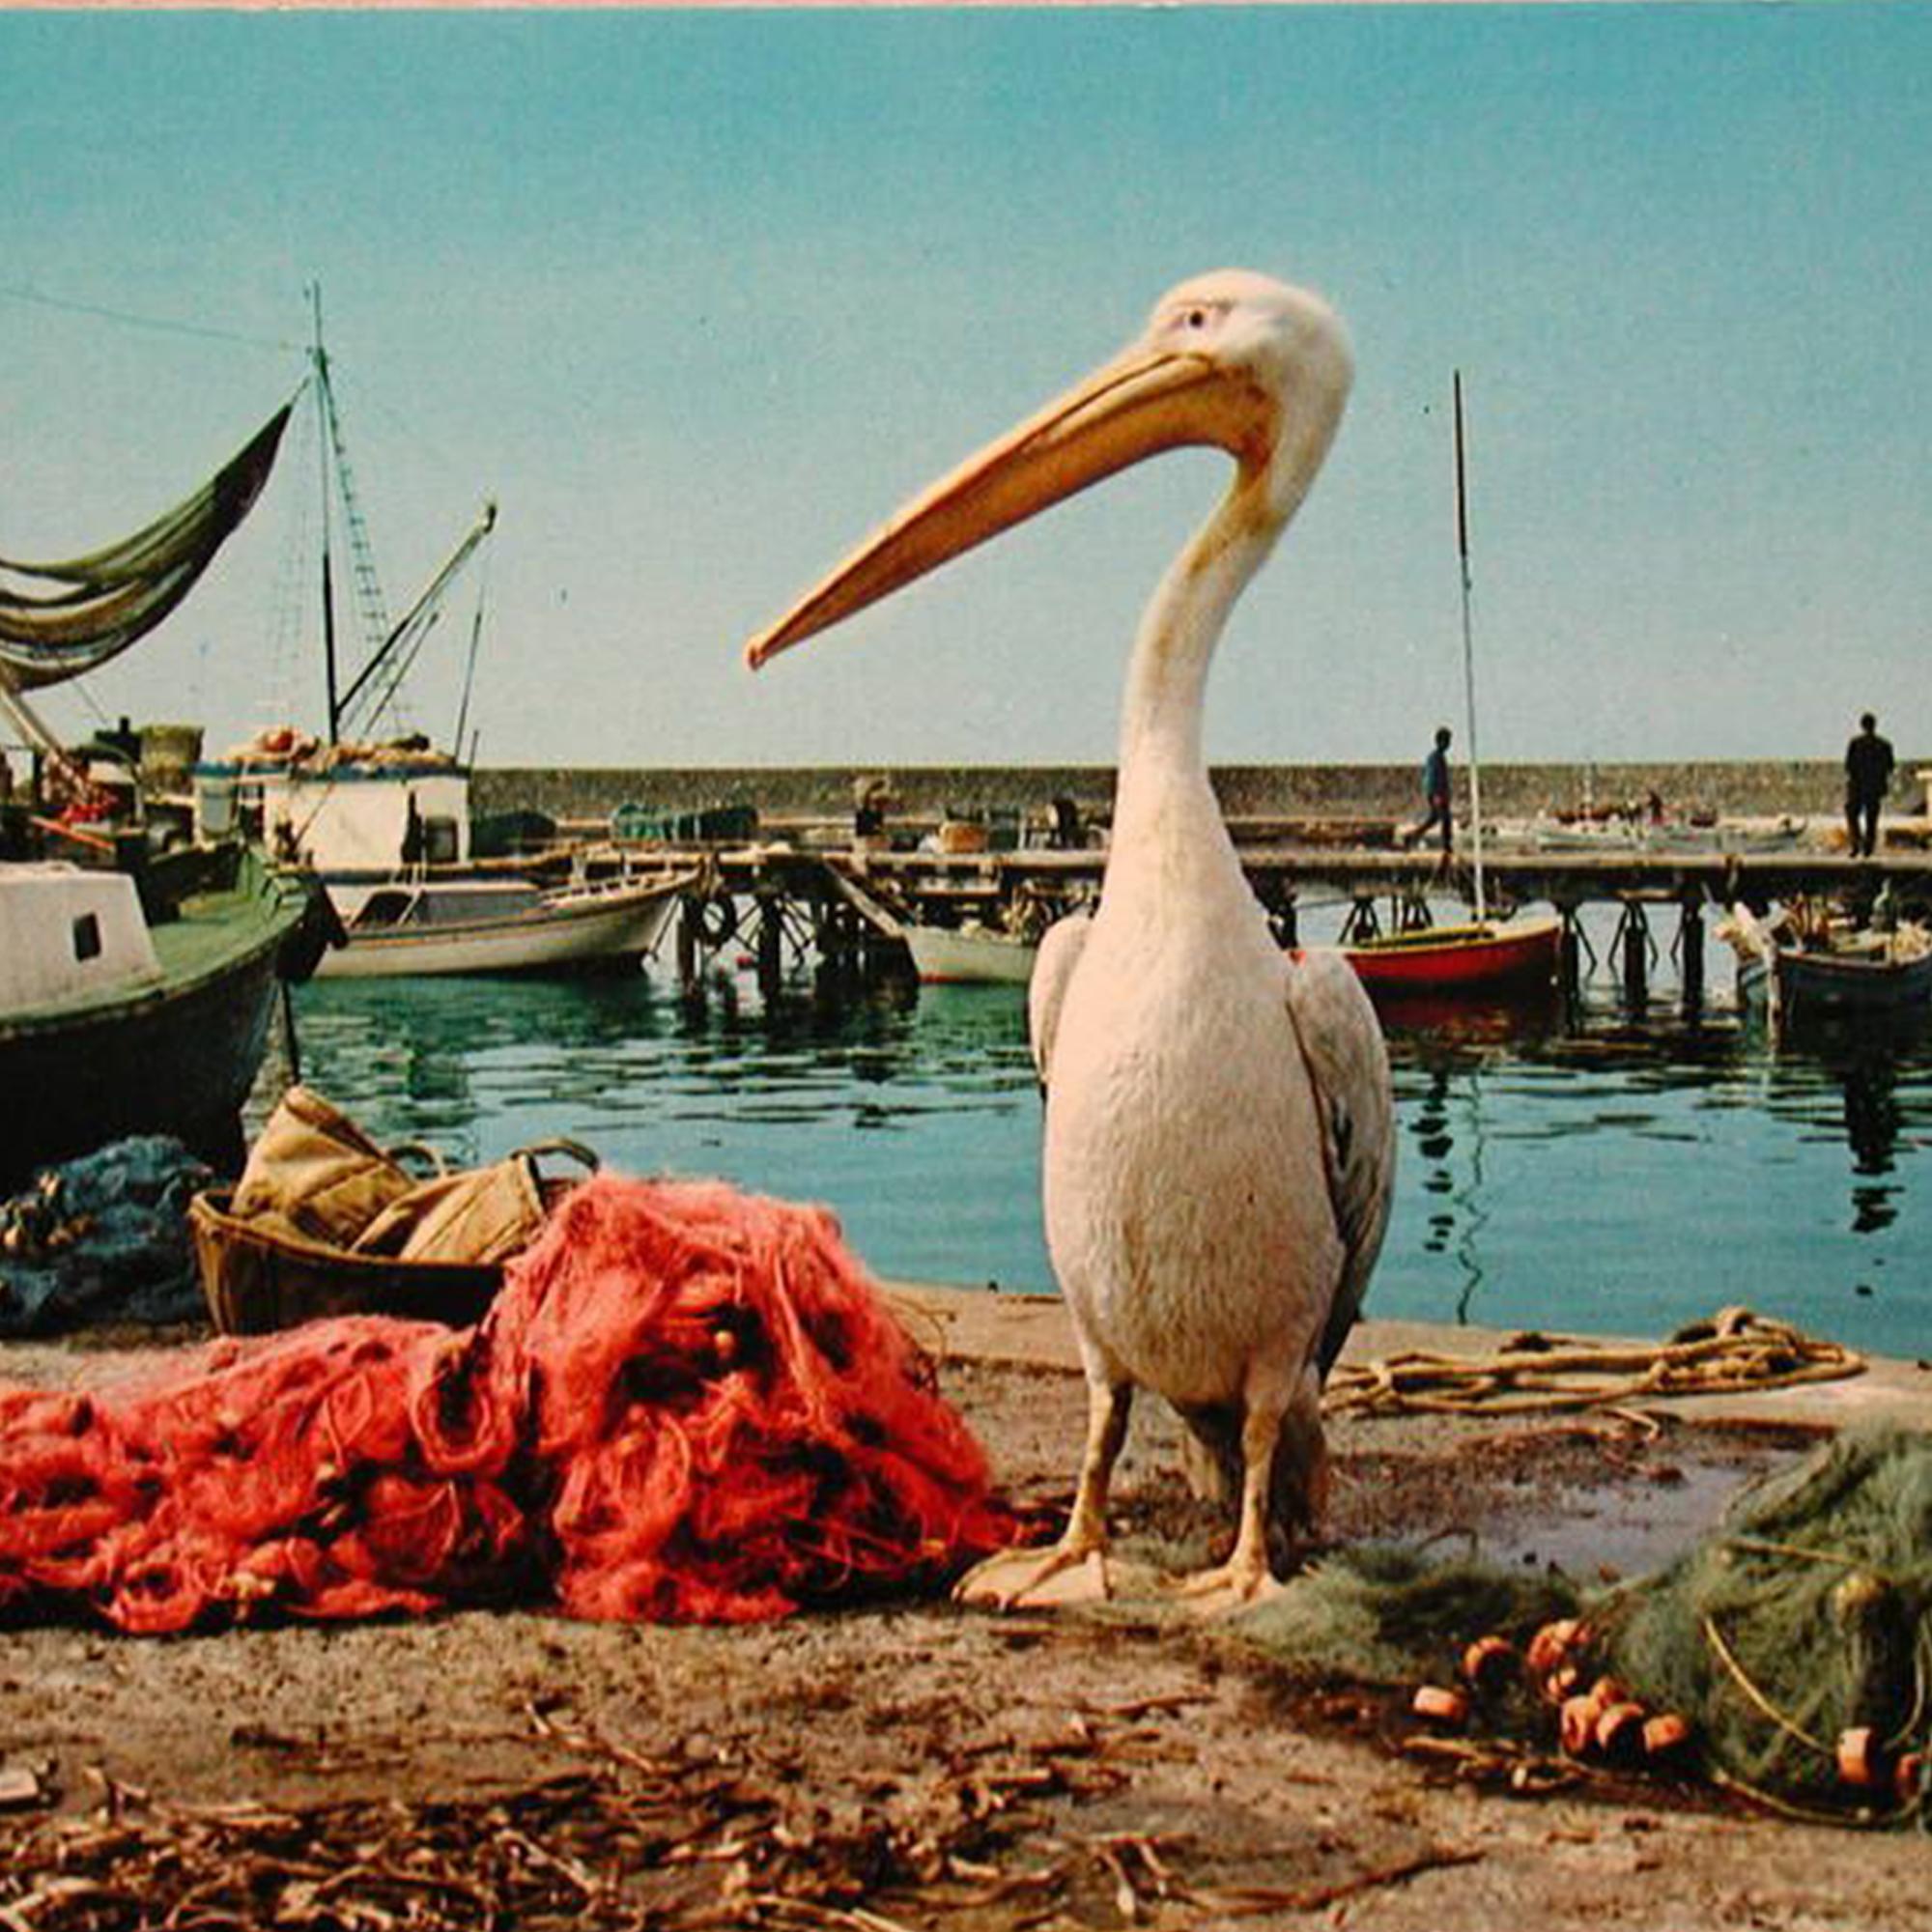 Kokos in his natural habitat - The Pelican Restaurant Paphos